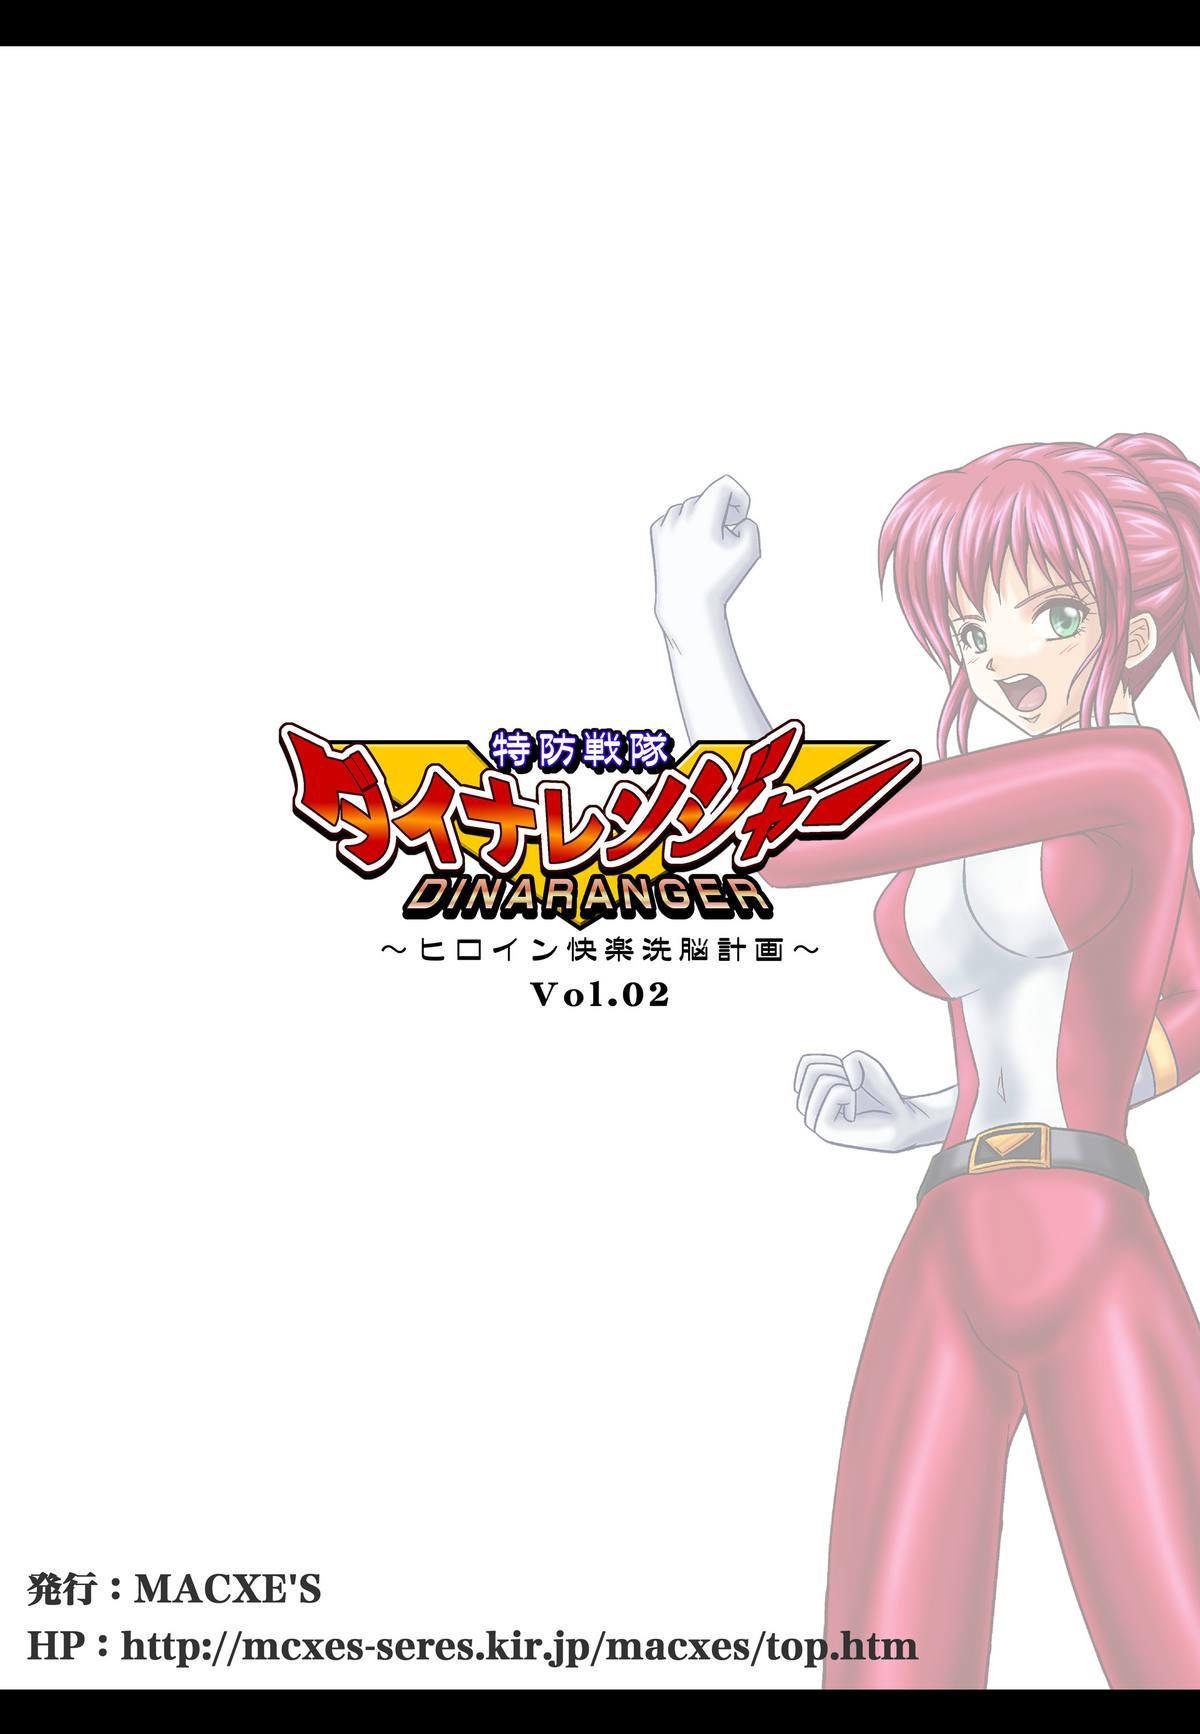 [Macxe's (monmon)] Tokubousentai Dinaranger ~Heroine Kairaku Sennou Keikaku~ Vol.01/02/03 (Renkaban) [Digital] 89